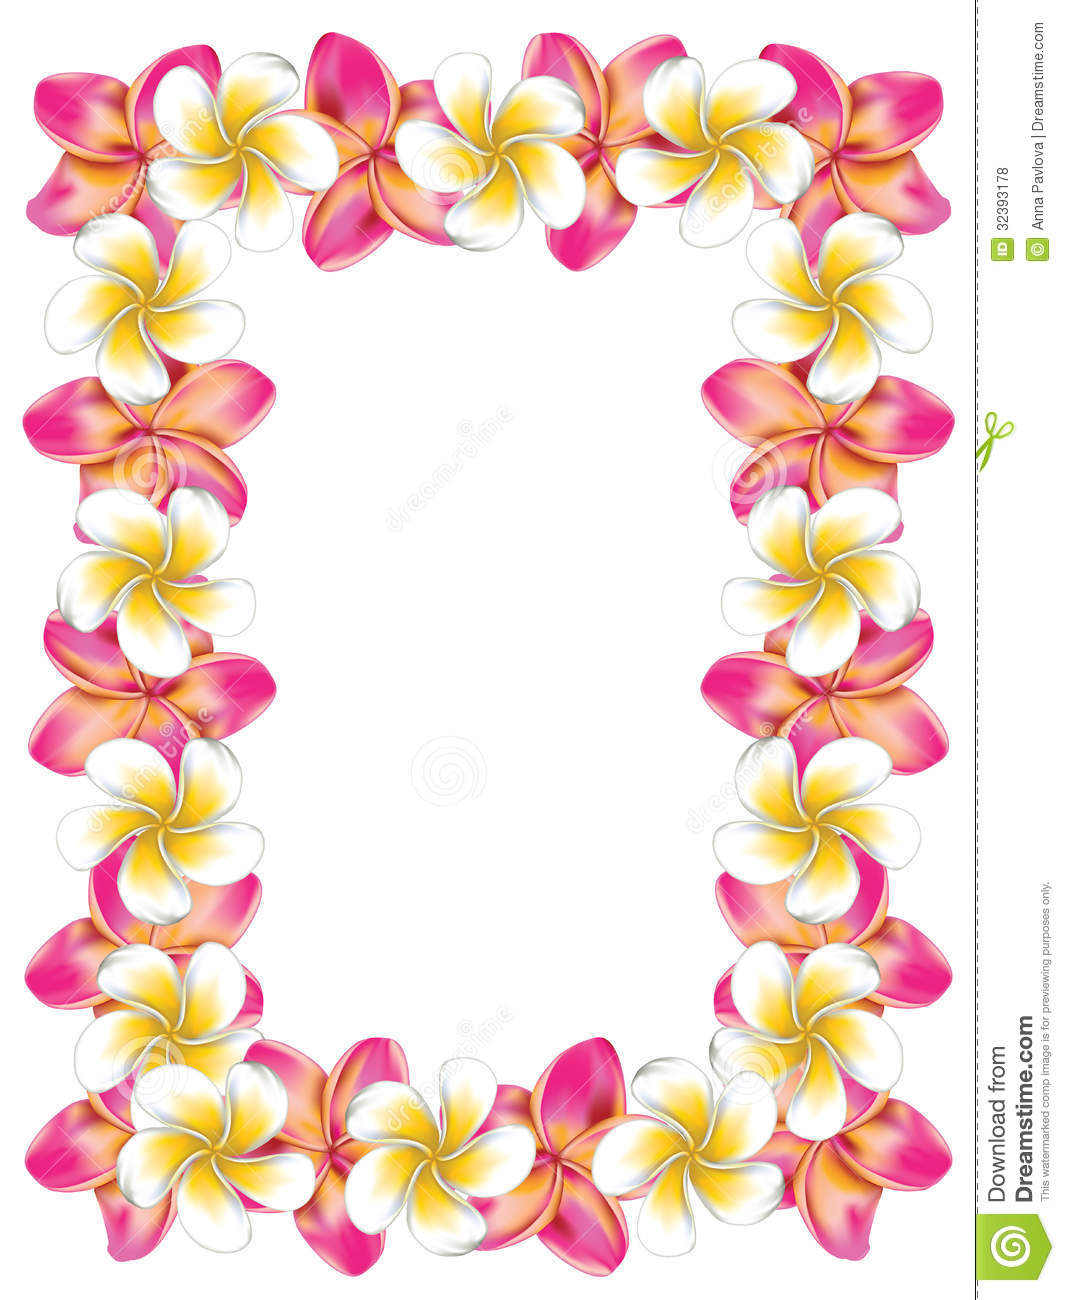 Free Hawaii Border Cliparts, Download Free Clip Art, Free.